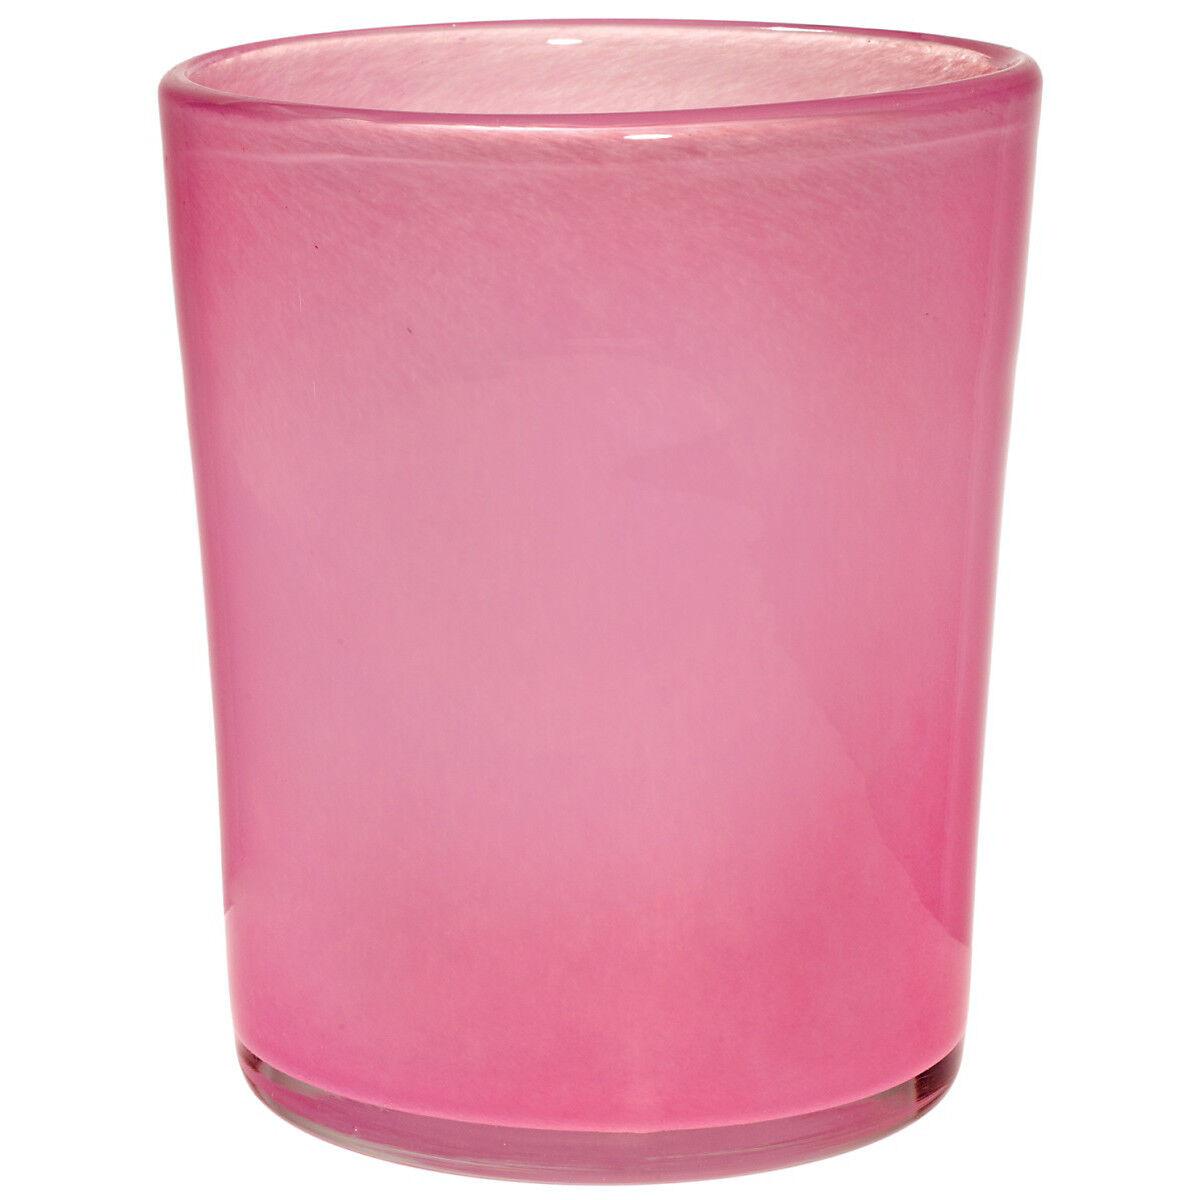 Vase pot  Couleuri  Fuchsia H = 23 cm, Handmade (art glass cristalica) gw02839